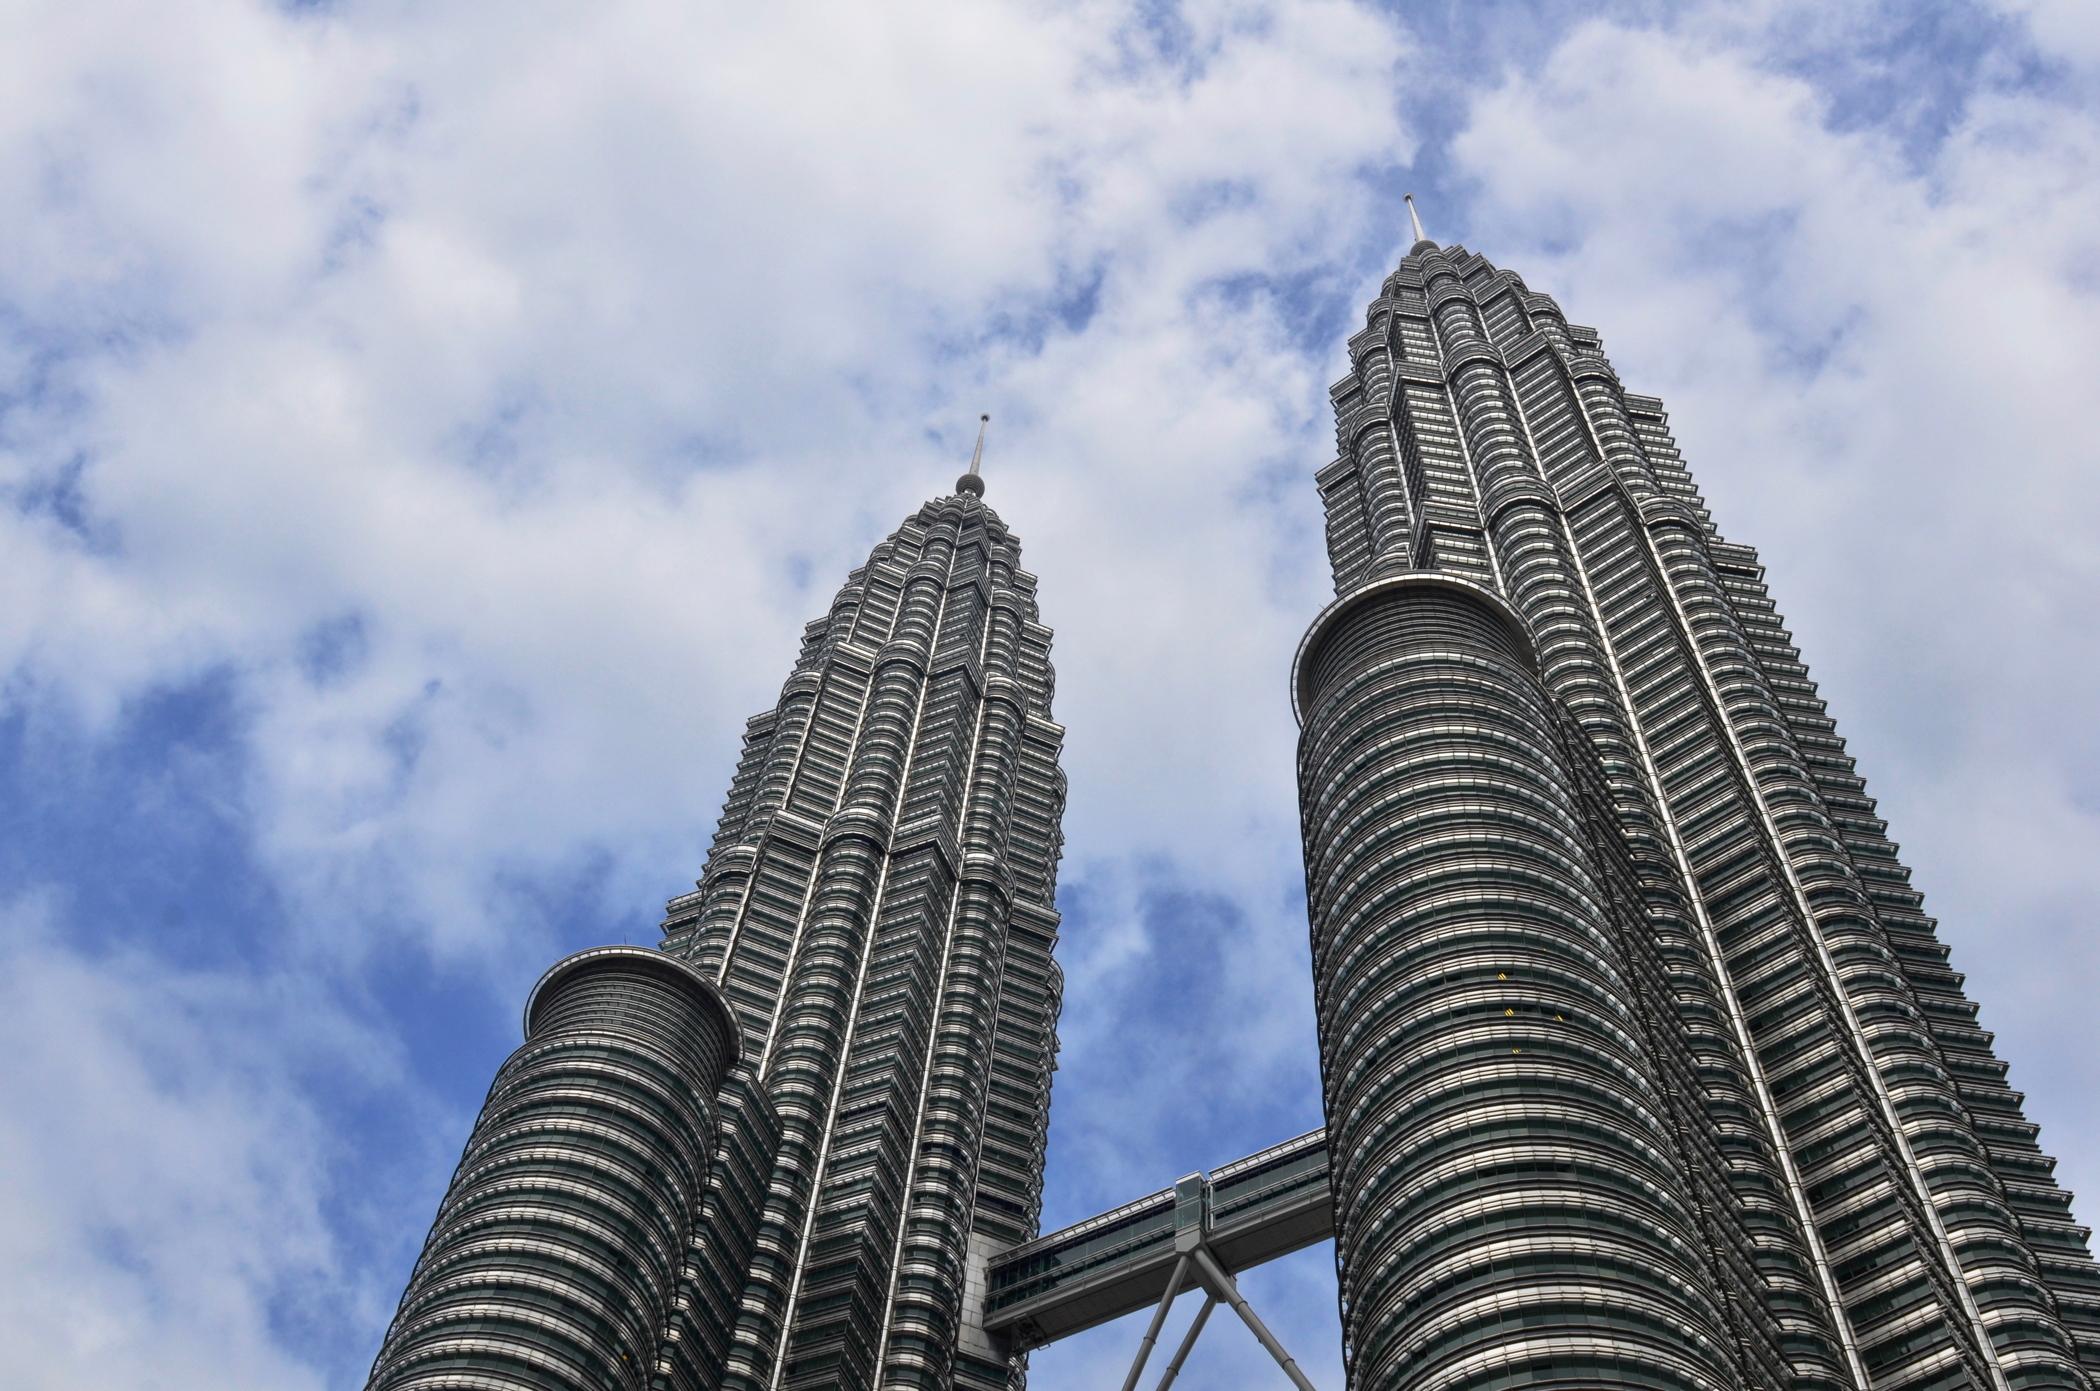 Großstadtdschungel-Malaysia-Kuala-Lumpur-Petronas-Towers